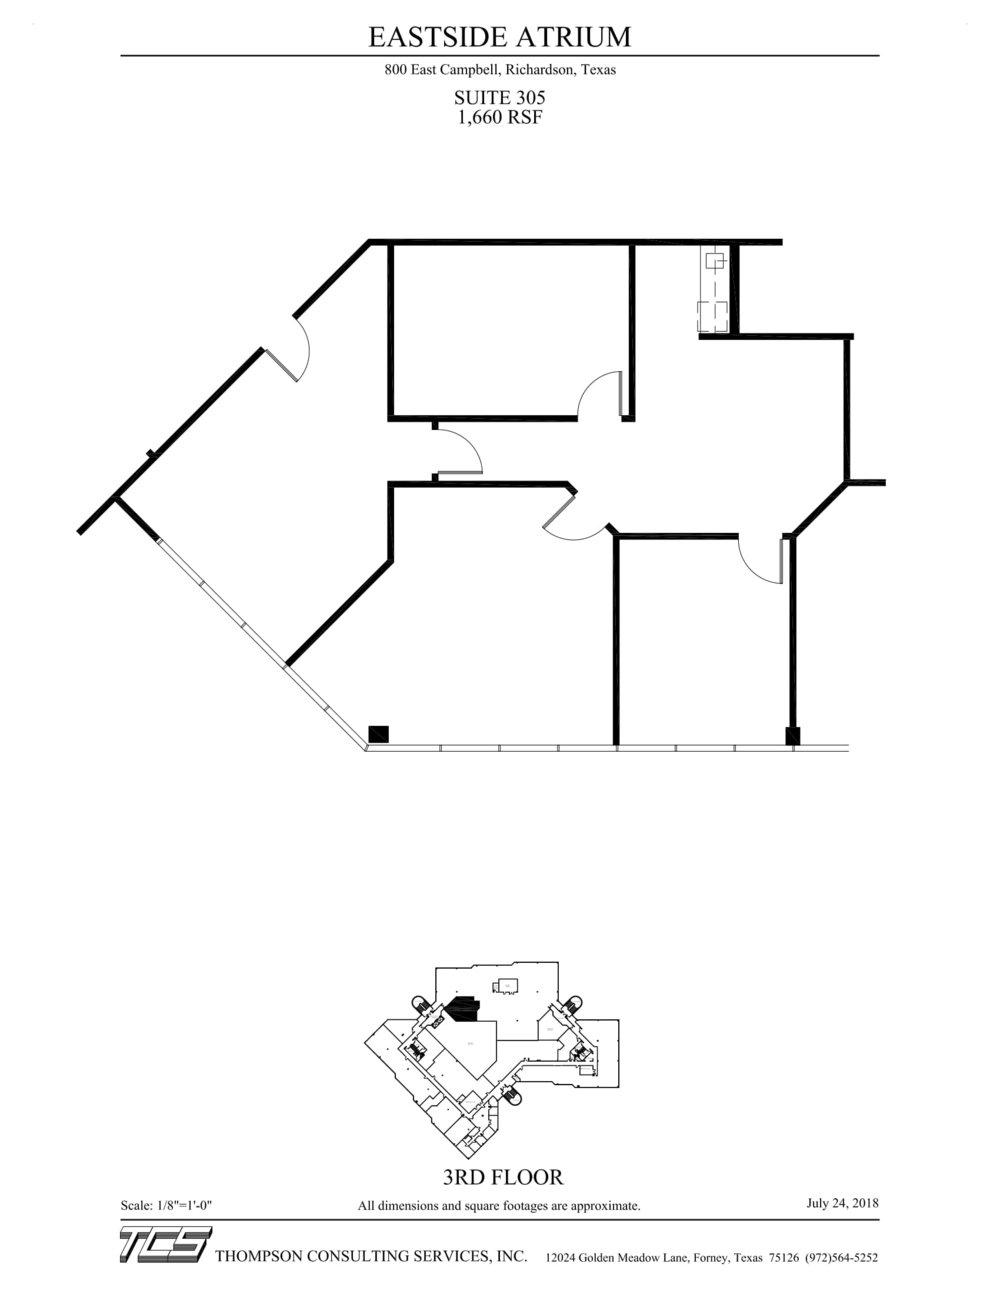 Eastside Atrium - Suite 305 - Marketing Plan-1